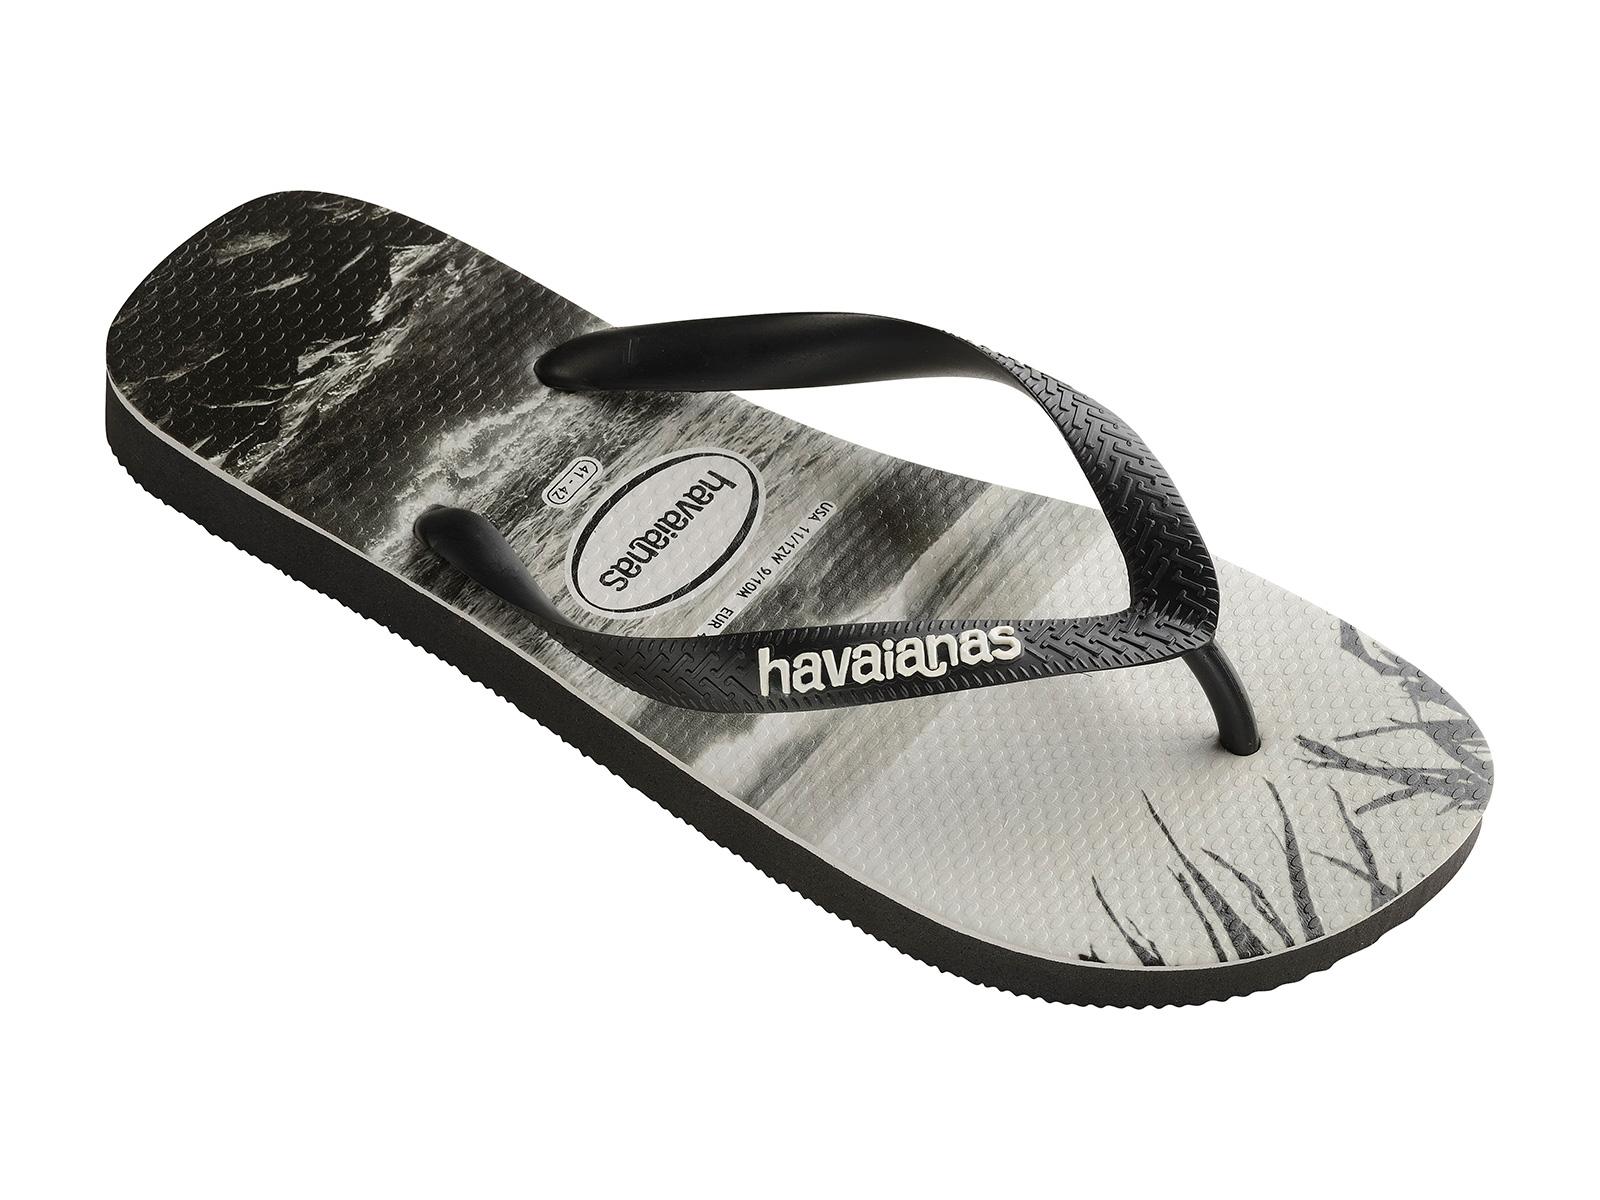 e904099c328194 Flip-Flops Flip-flops - Havaianas Top Photoprint Black